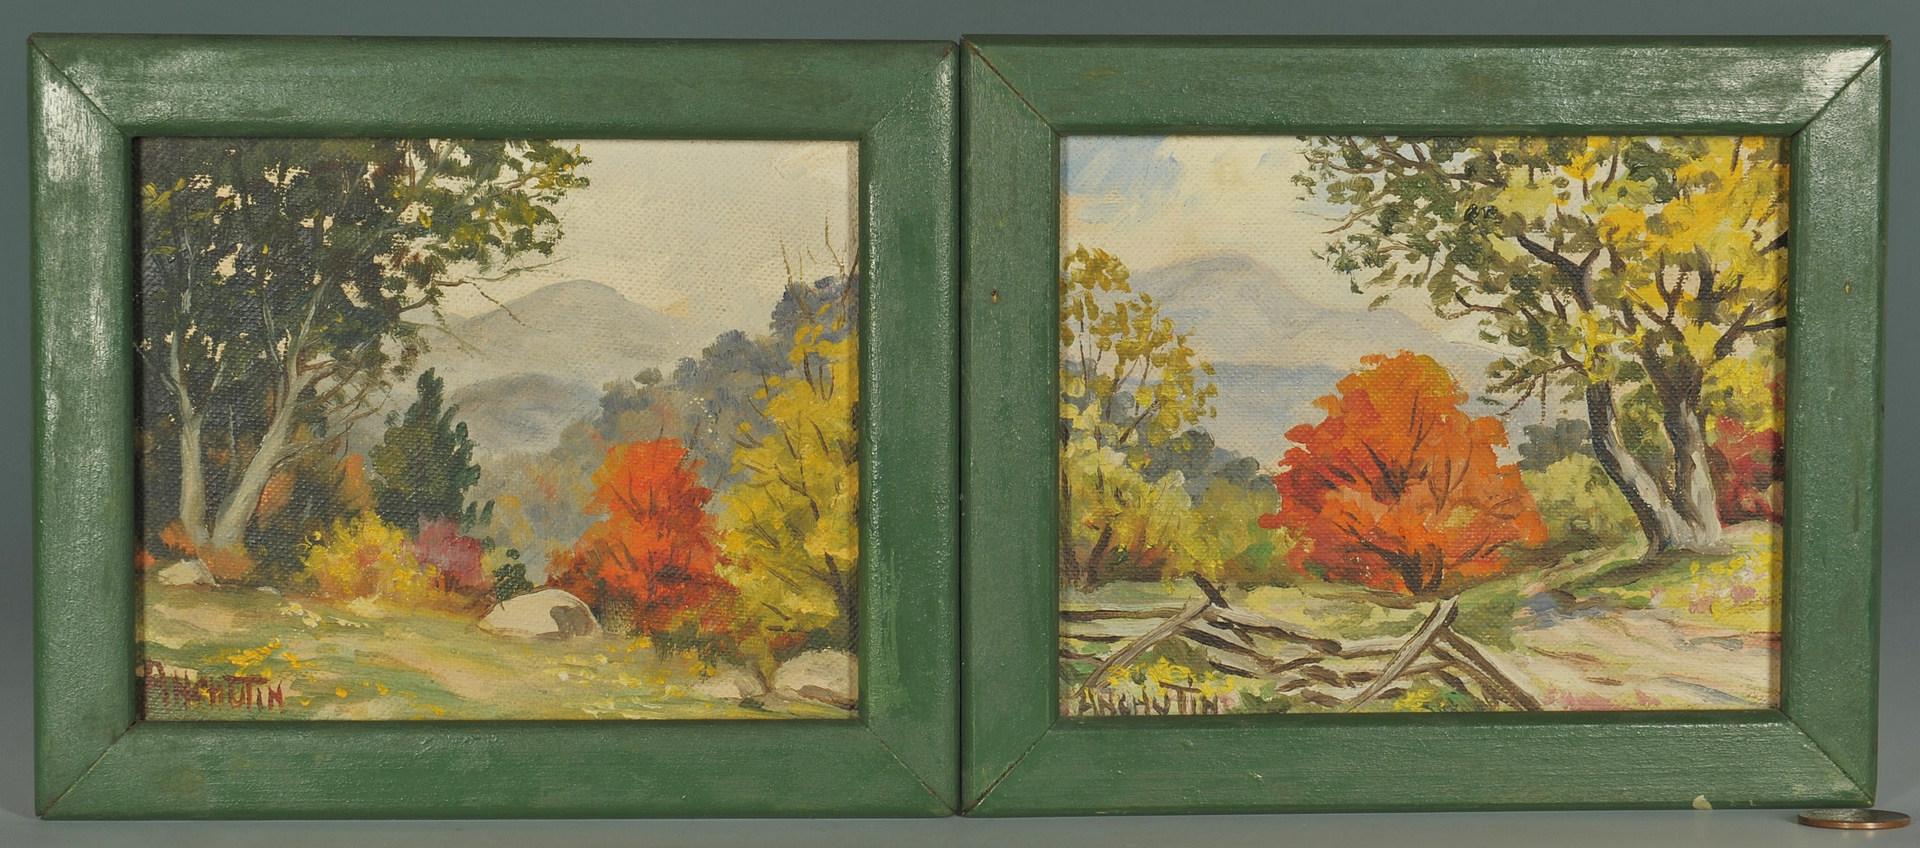 Lot 367: 2 Jacob Anchutin Smoky Mountain Scenes